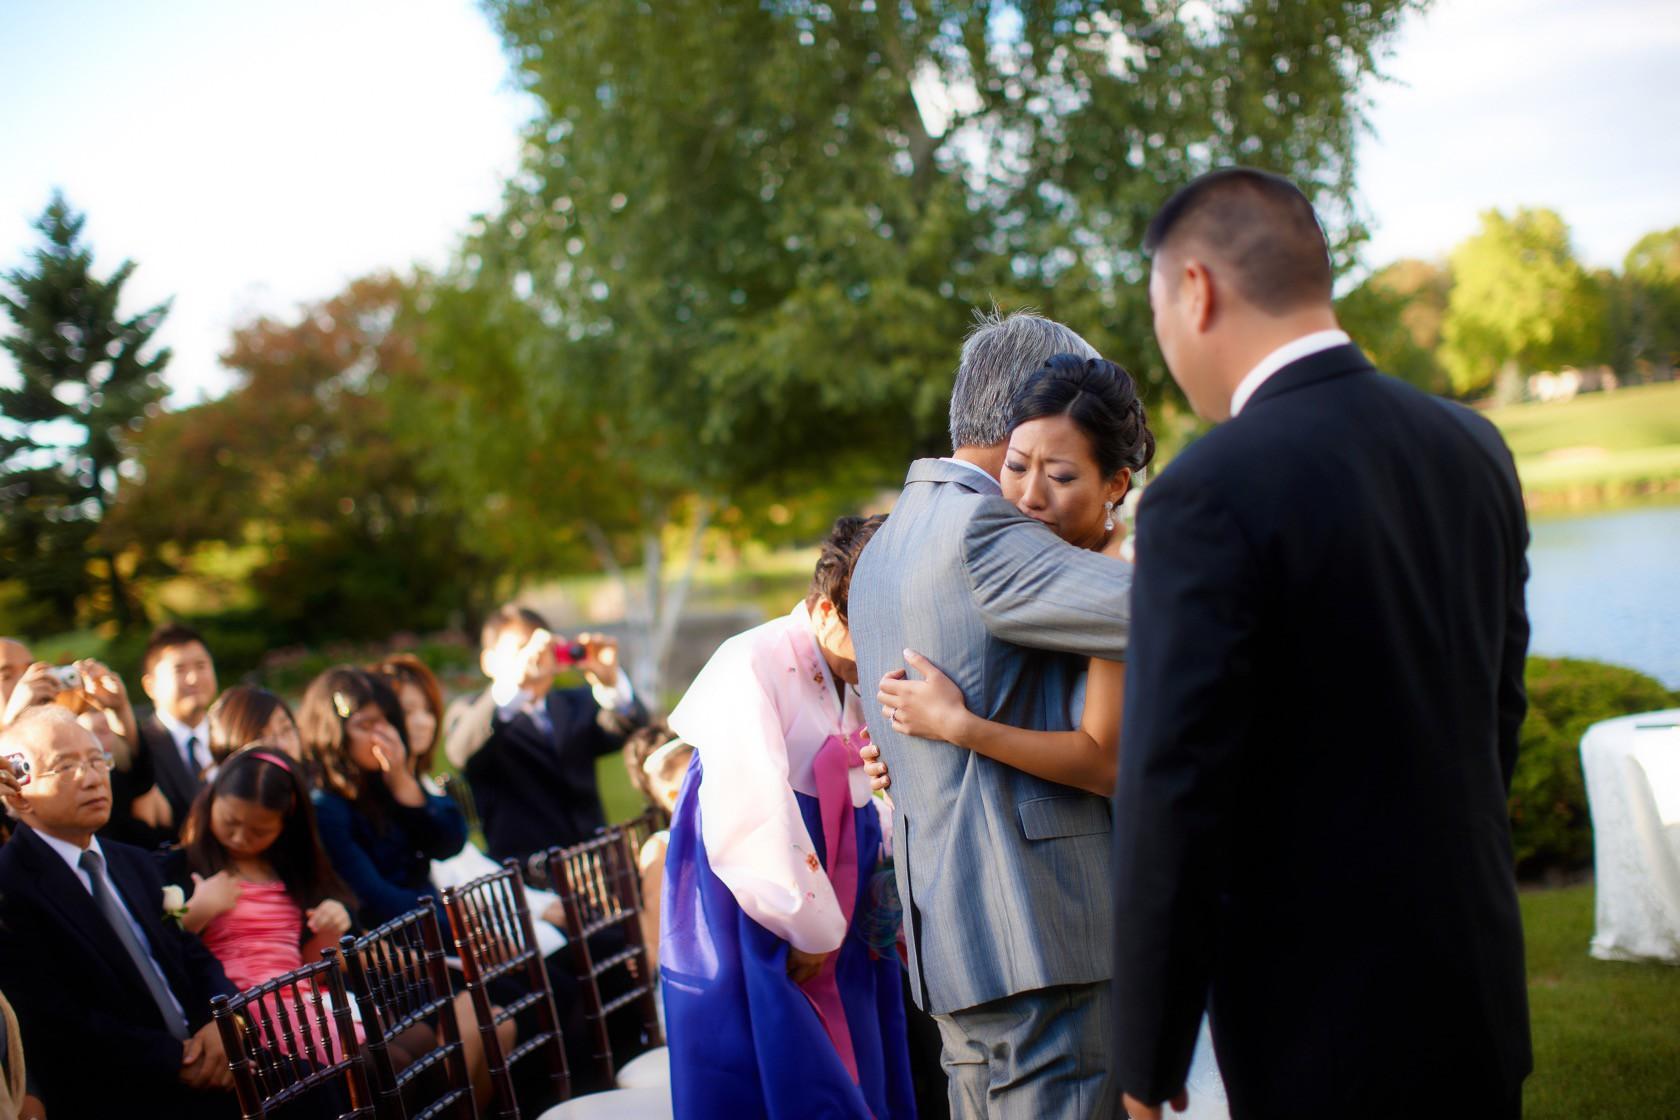 stephen sager photography 0027 fine art wedding photography